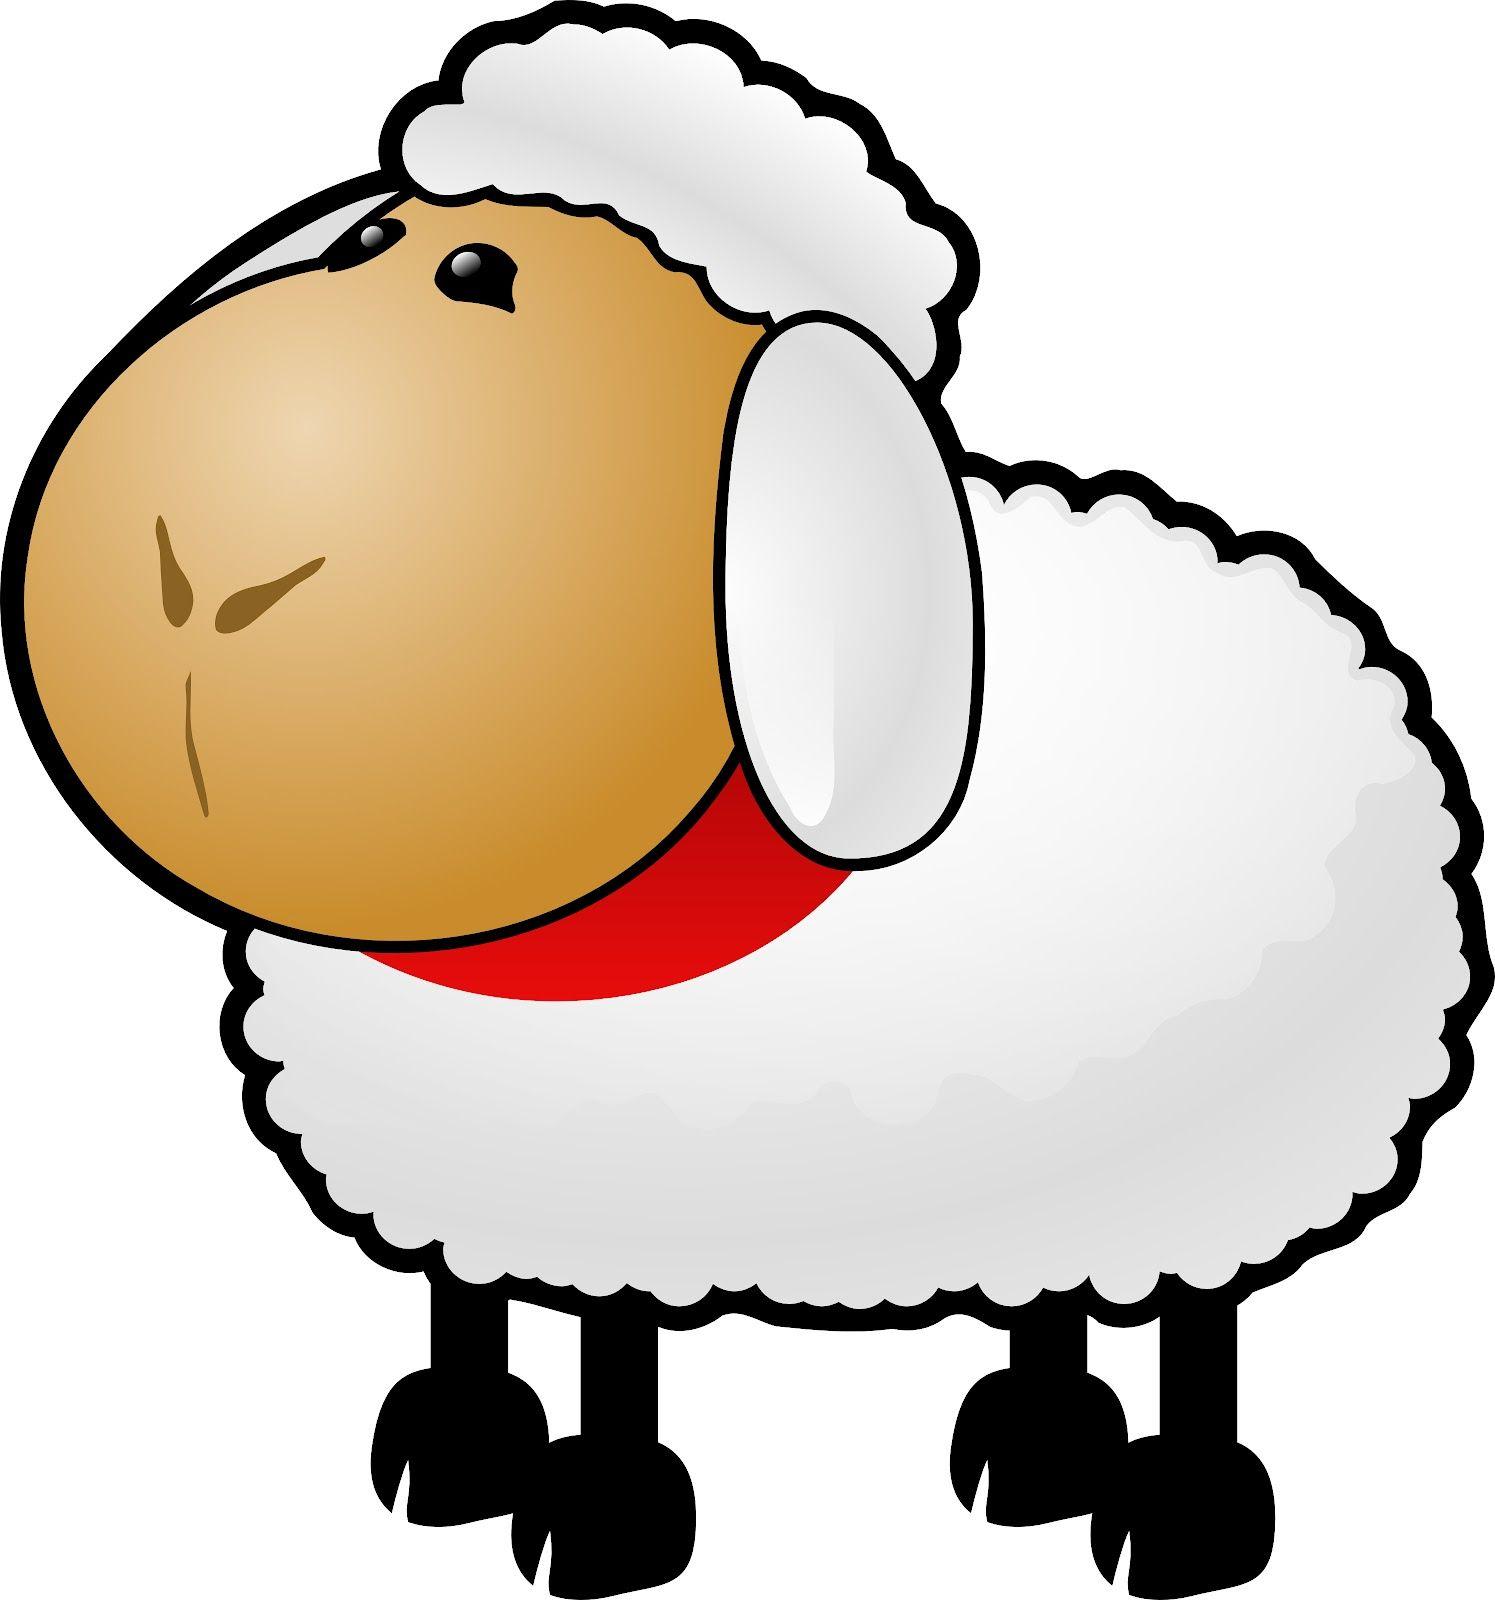 Clip Art Farm Animals Sheep Cartoon Free Clip Art Cartoon Drawings Of Animals